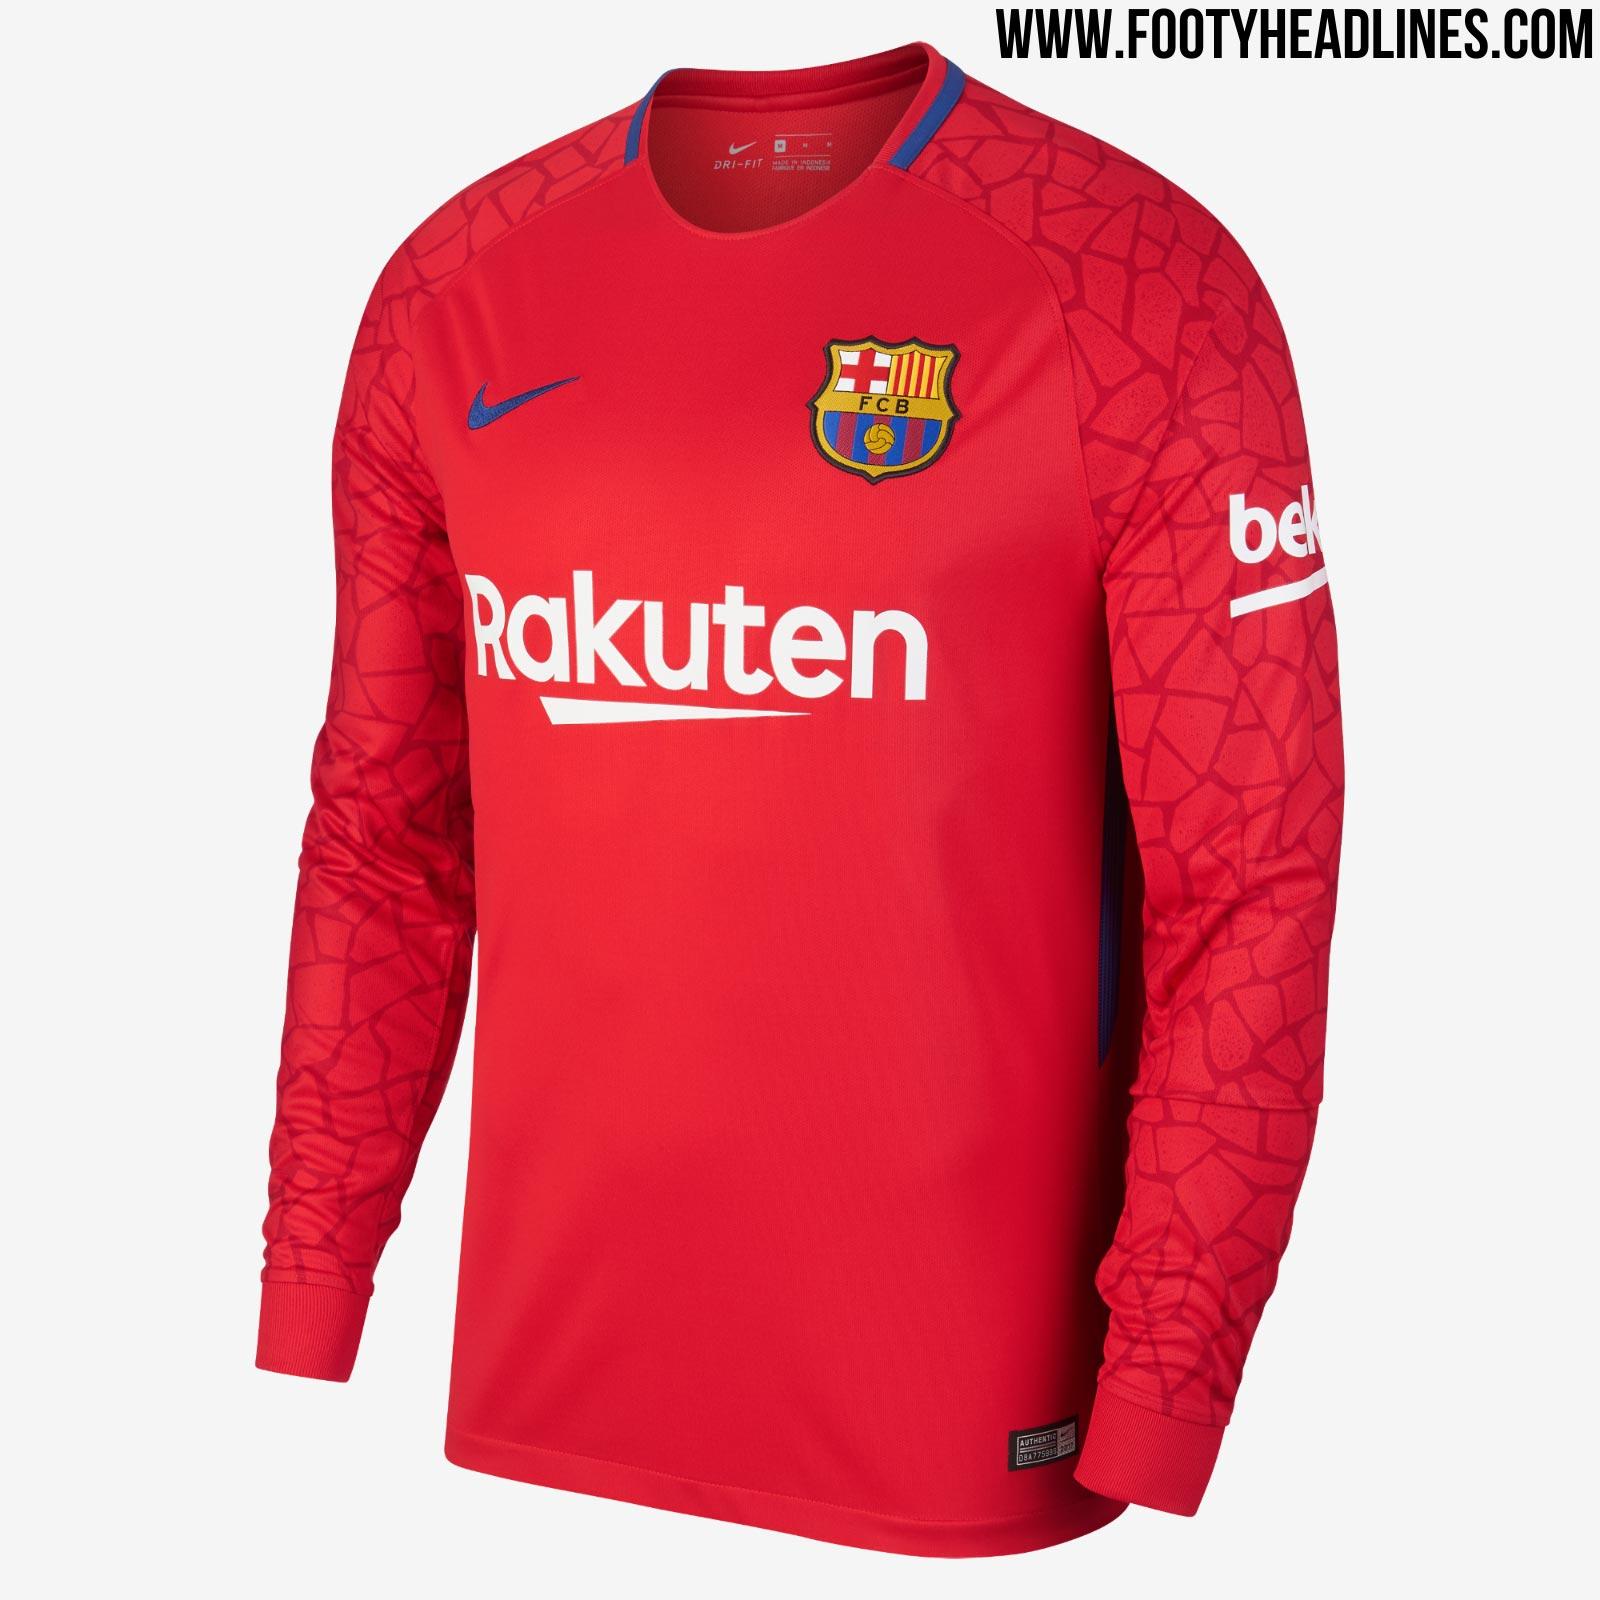 barcelona 17 18 goalkeeper kits revealed footy headlines gk logistics agency sia gk logistics rancho cucamonga